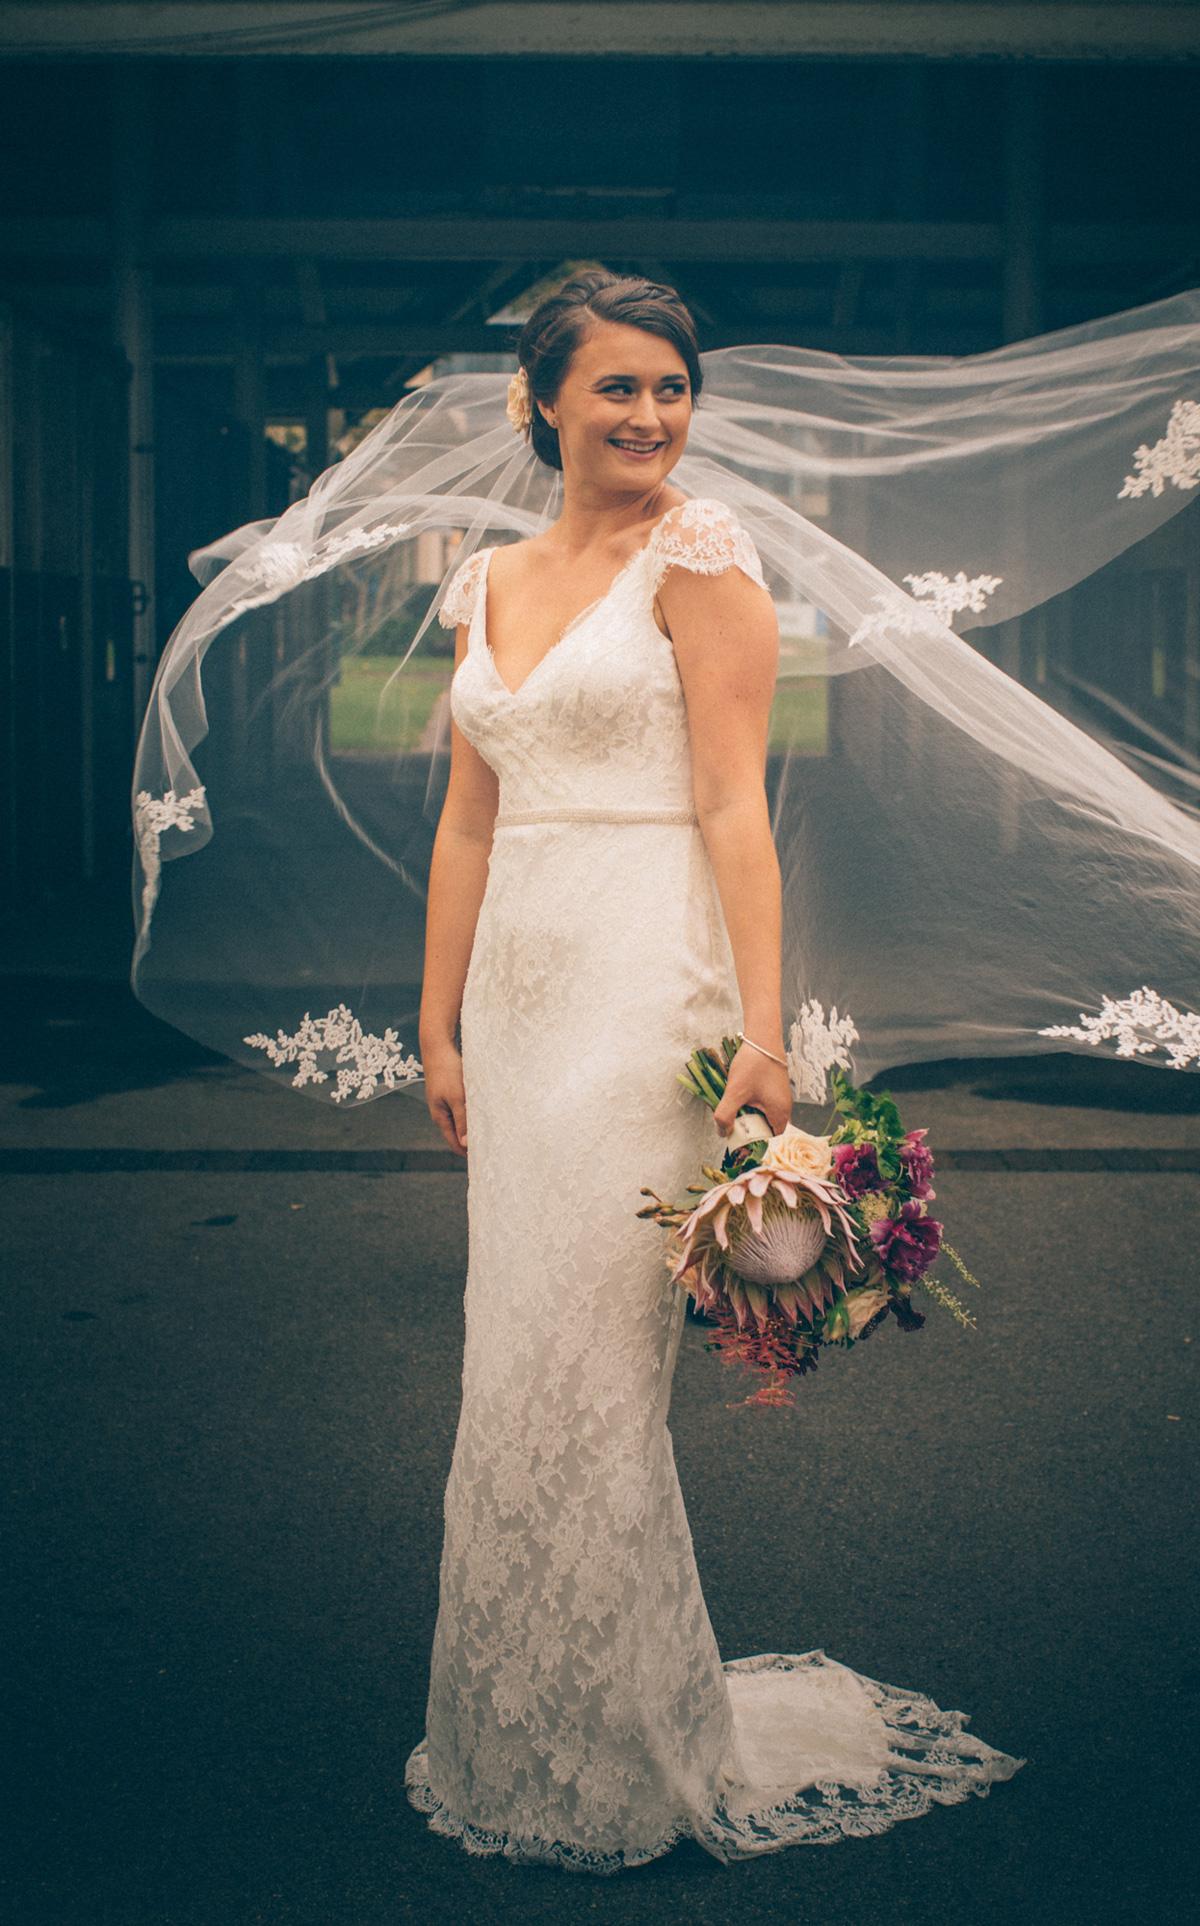 052-Eloise-&-Boshko-Wedding